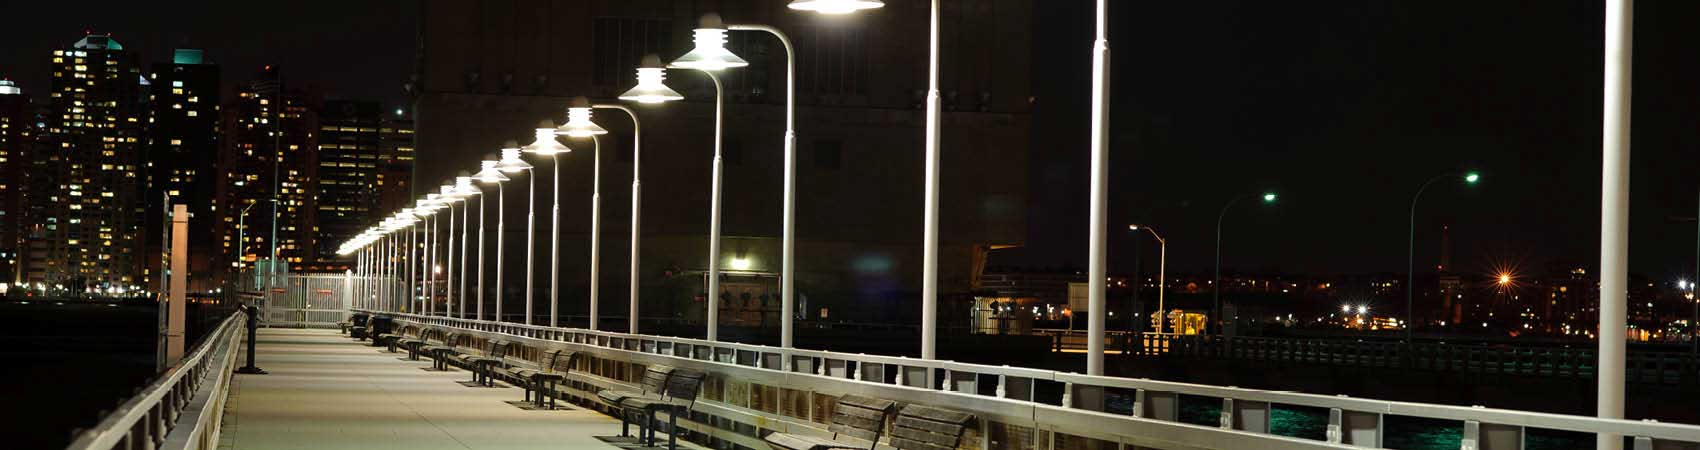 LightingSystems-HERO-4